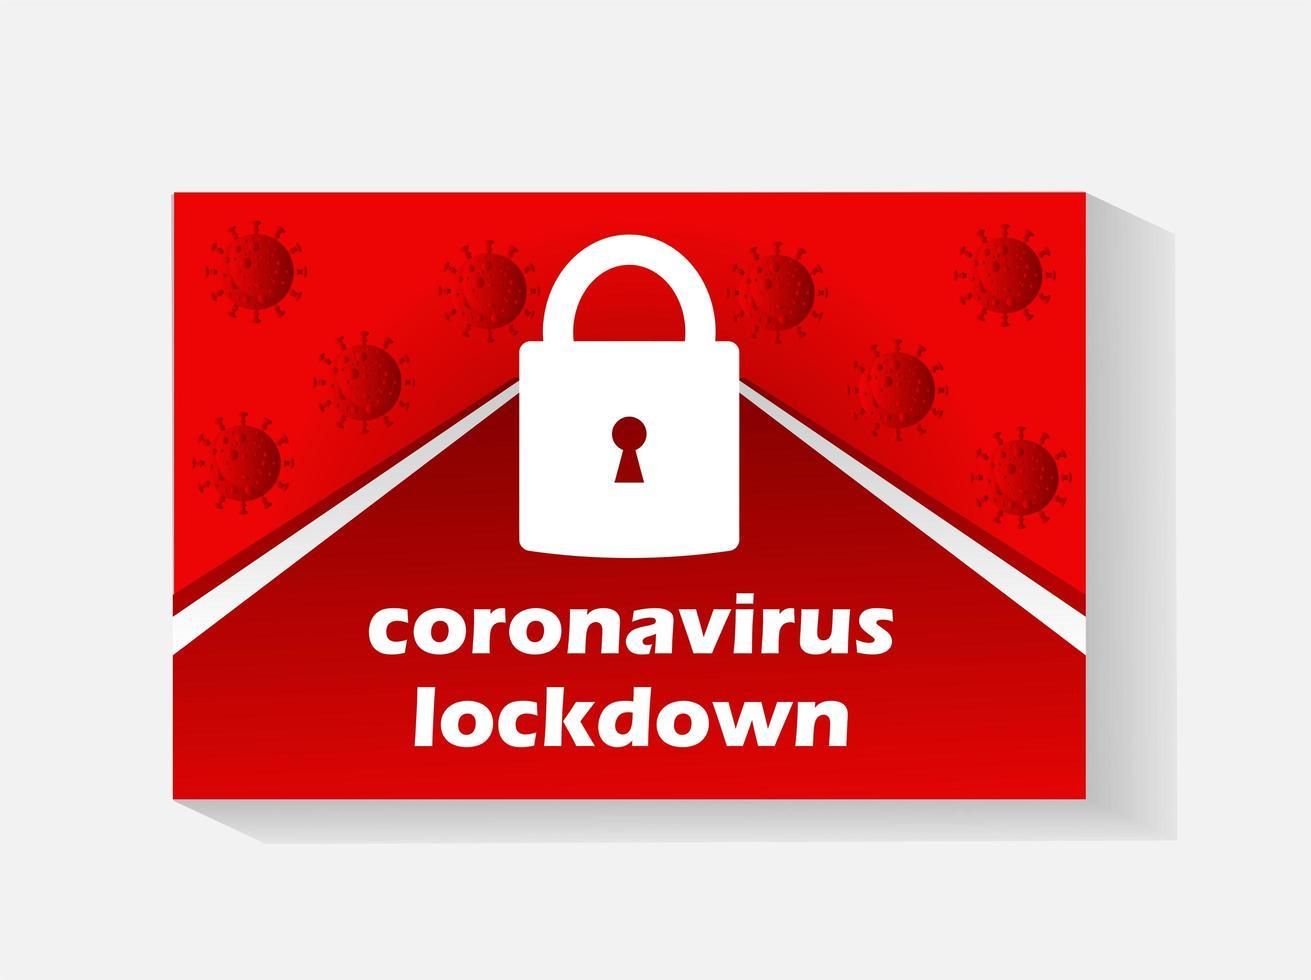 símbolo de bloqueio global do coronavírus vetor